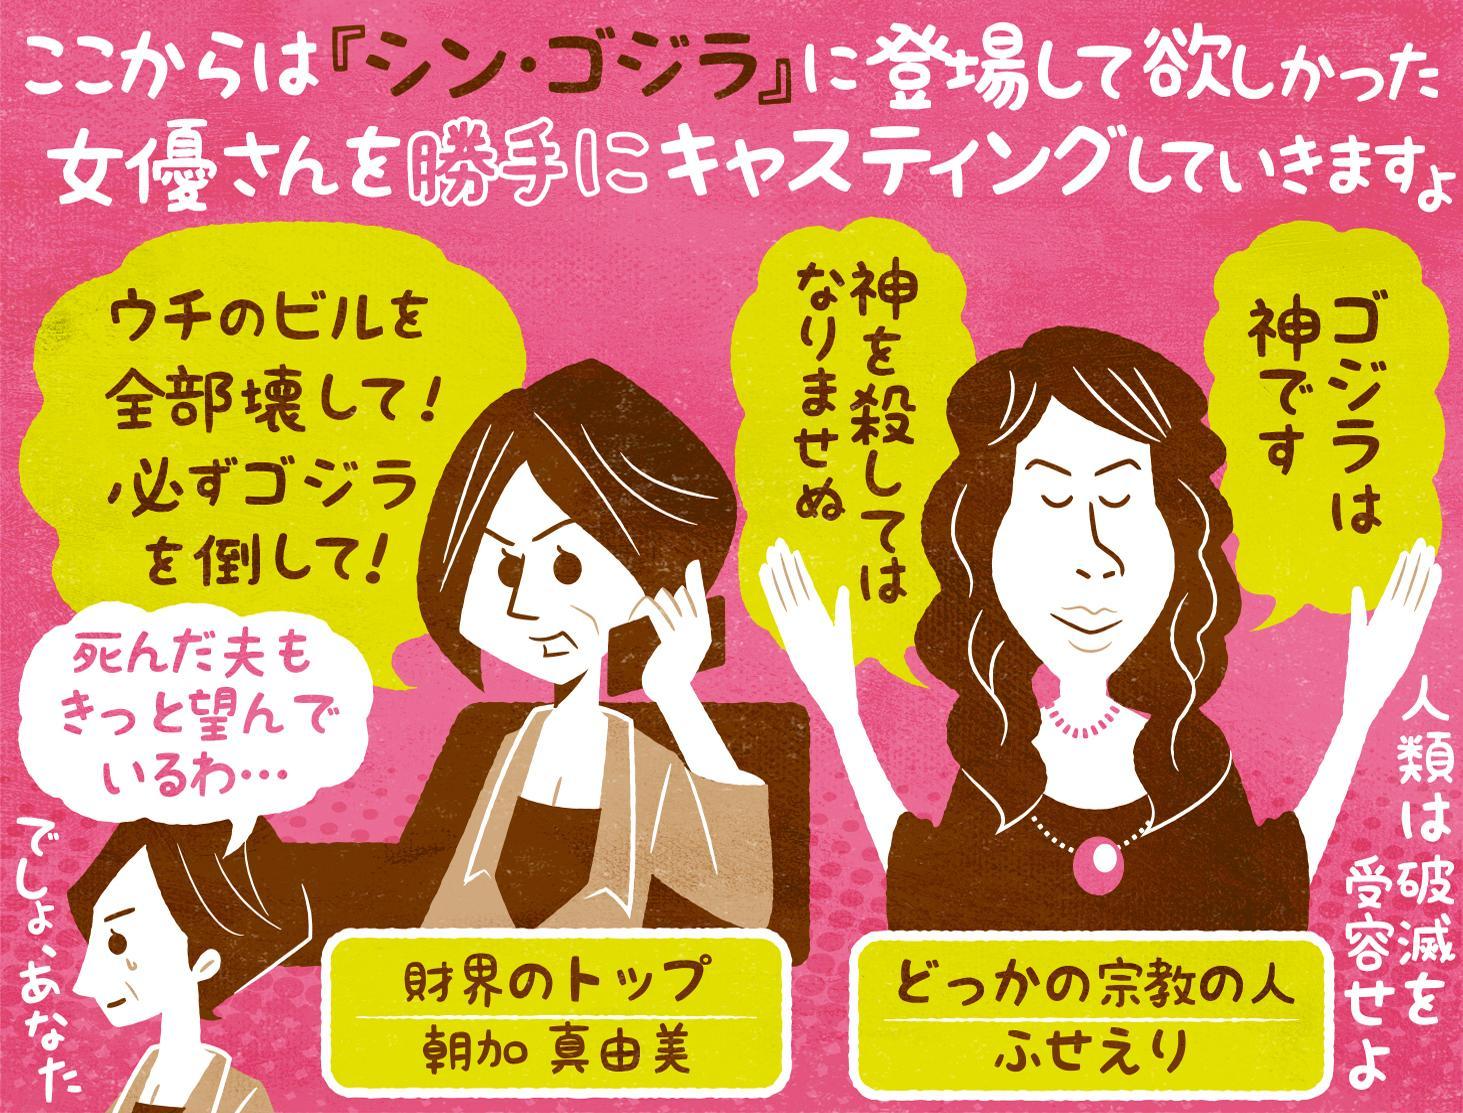 http://4koma-eiga.jp/fourcell2/arcade/entry/1574/img2.jpg